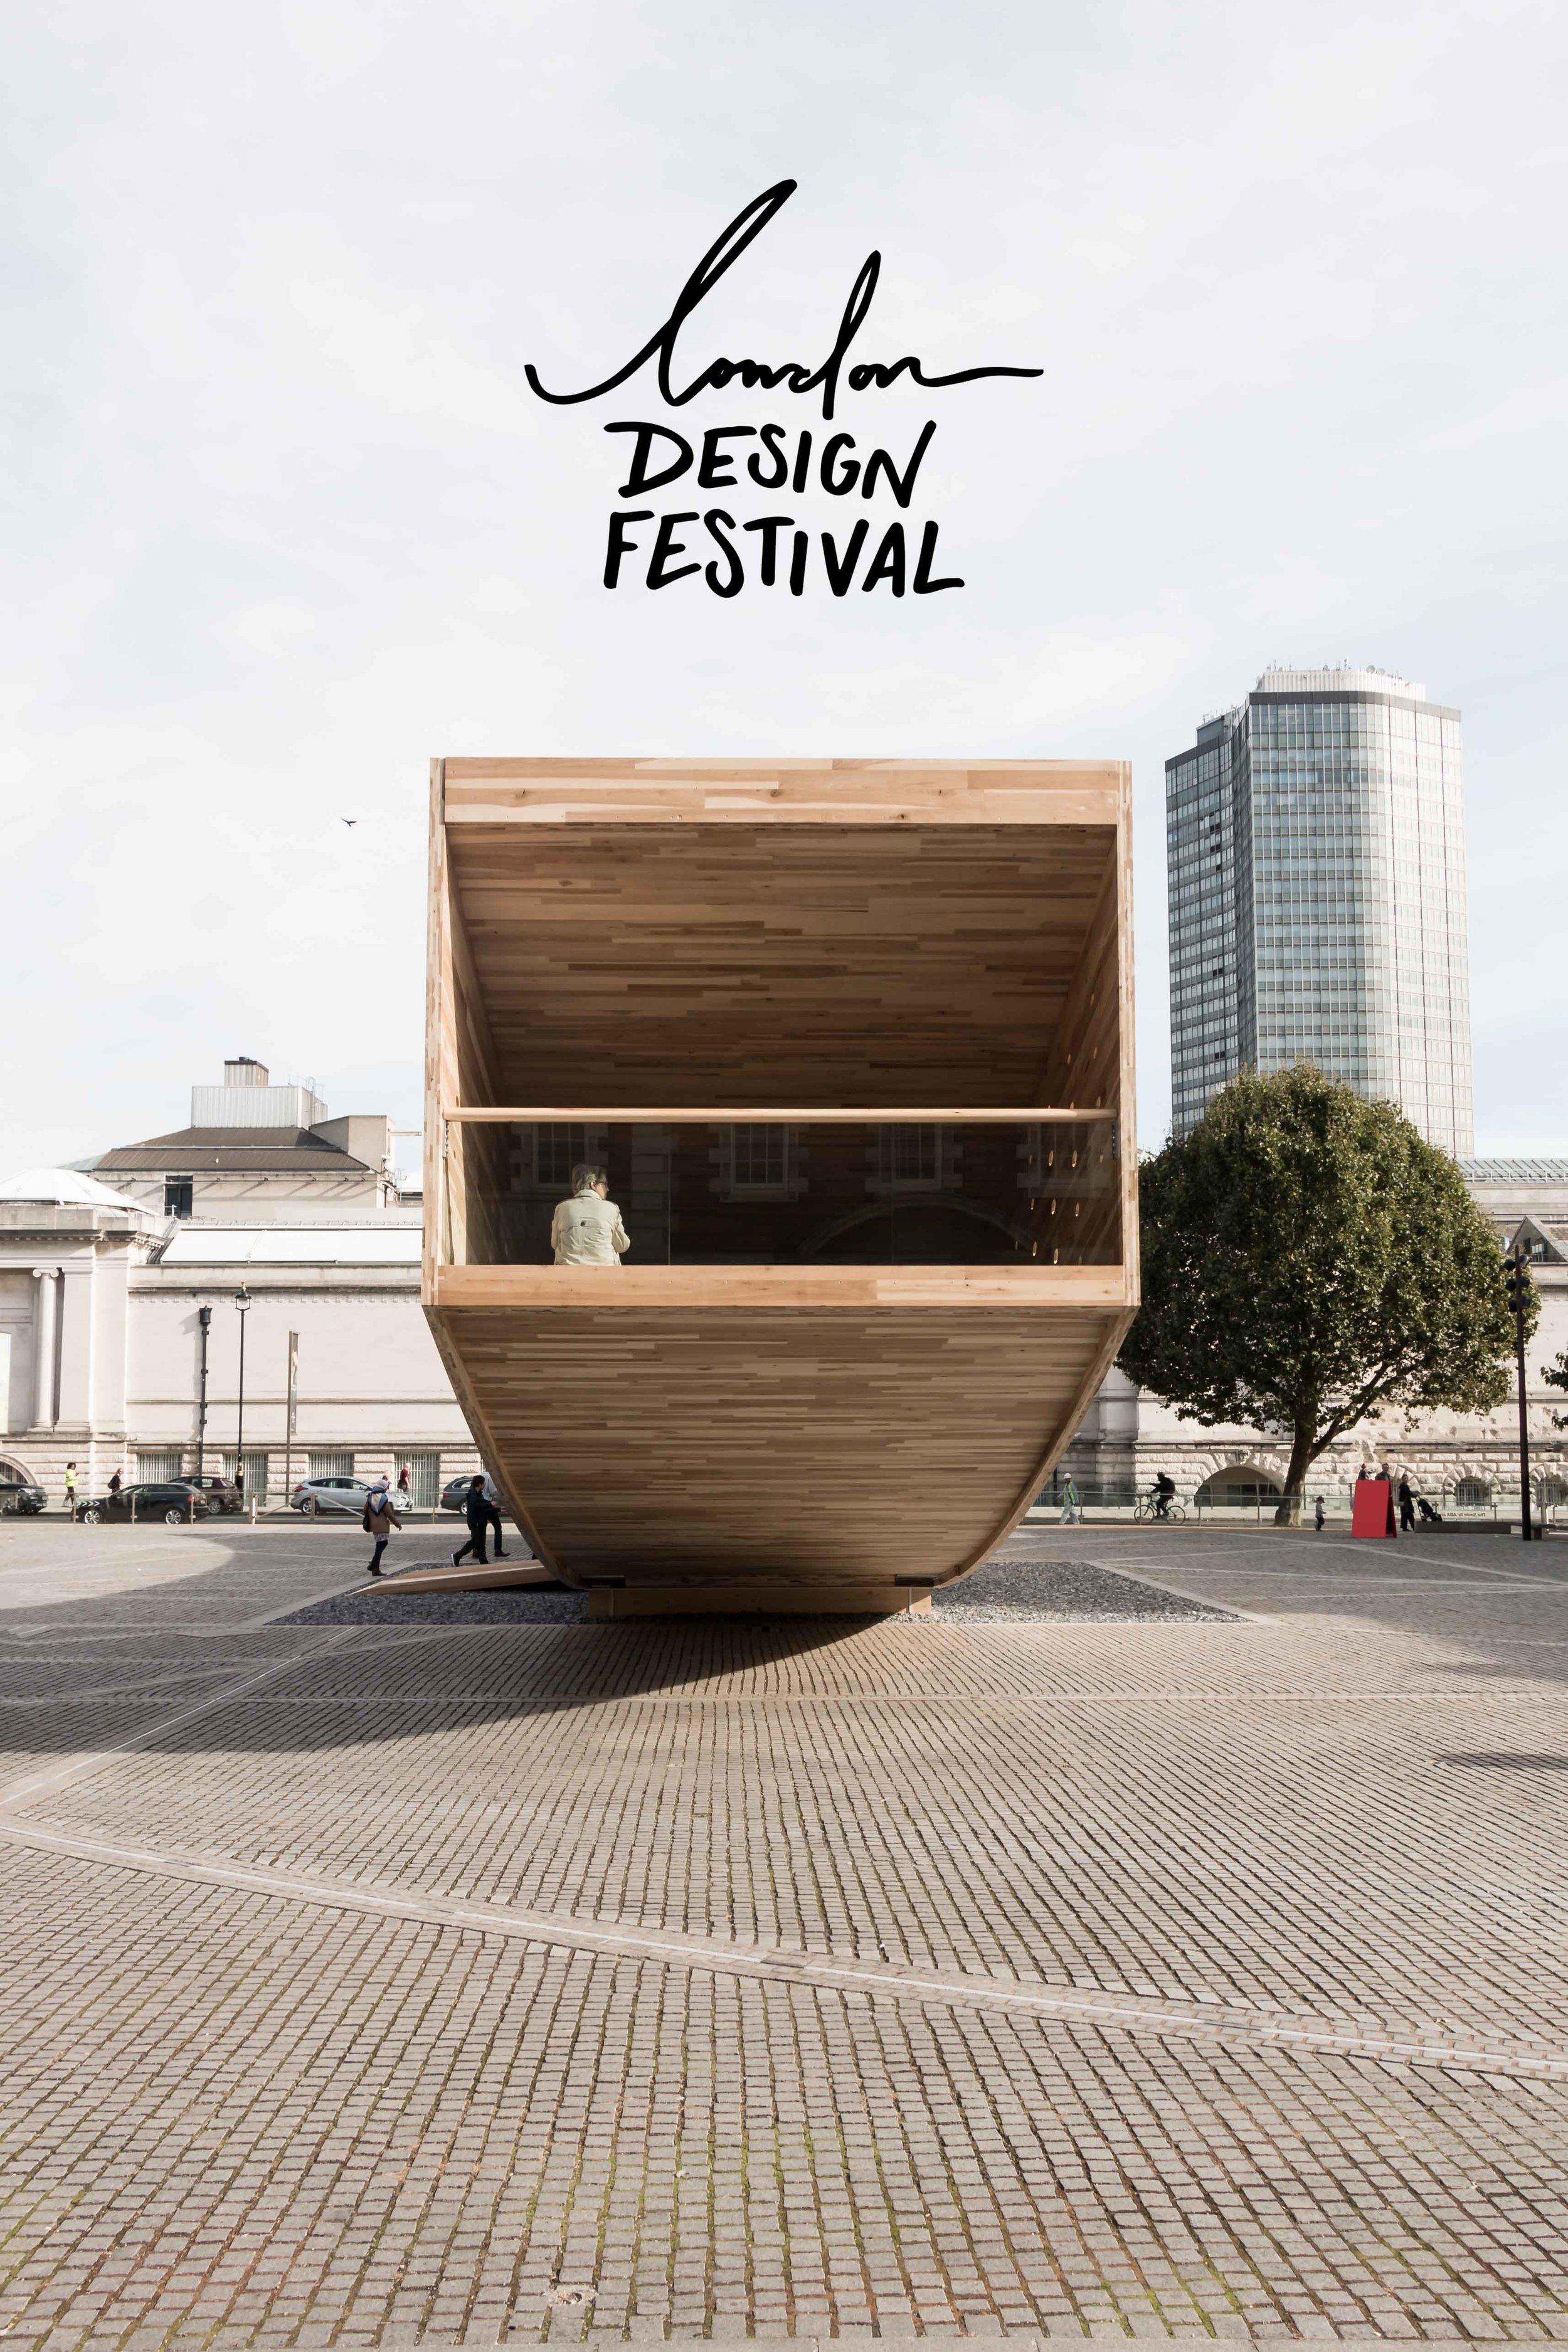 London Design Festival 2016 | Sea of Atlas